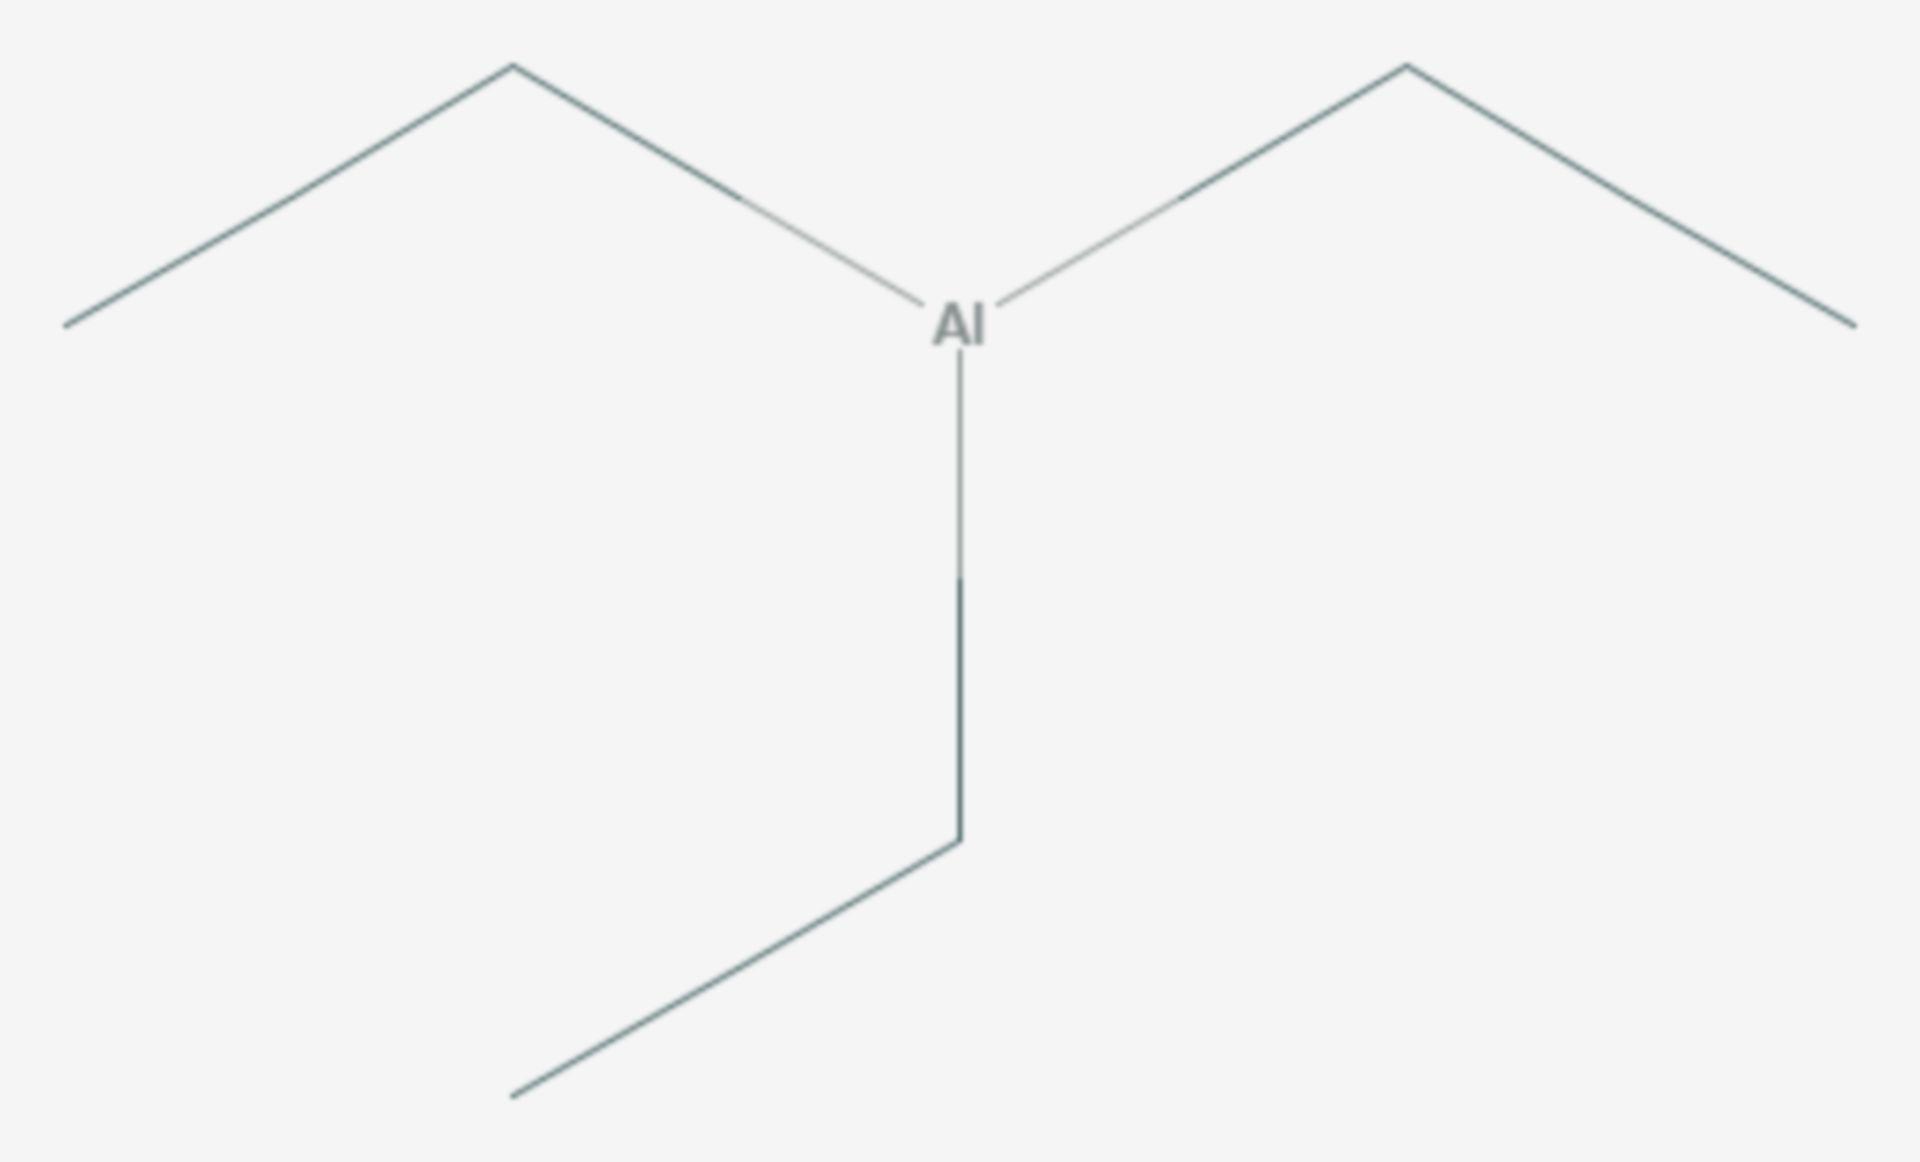 Triethylaluminium (Strukturformel)